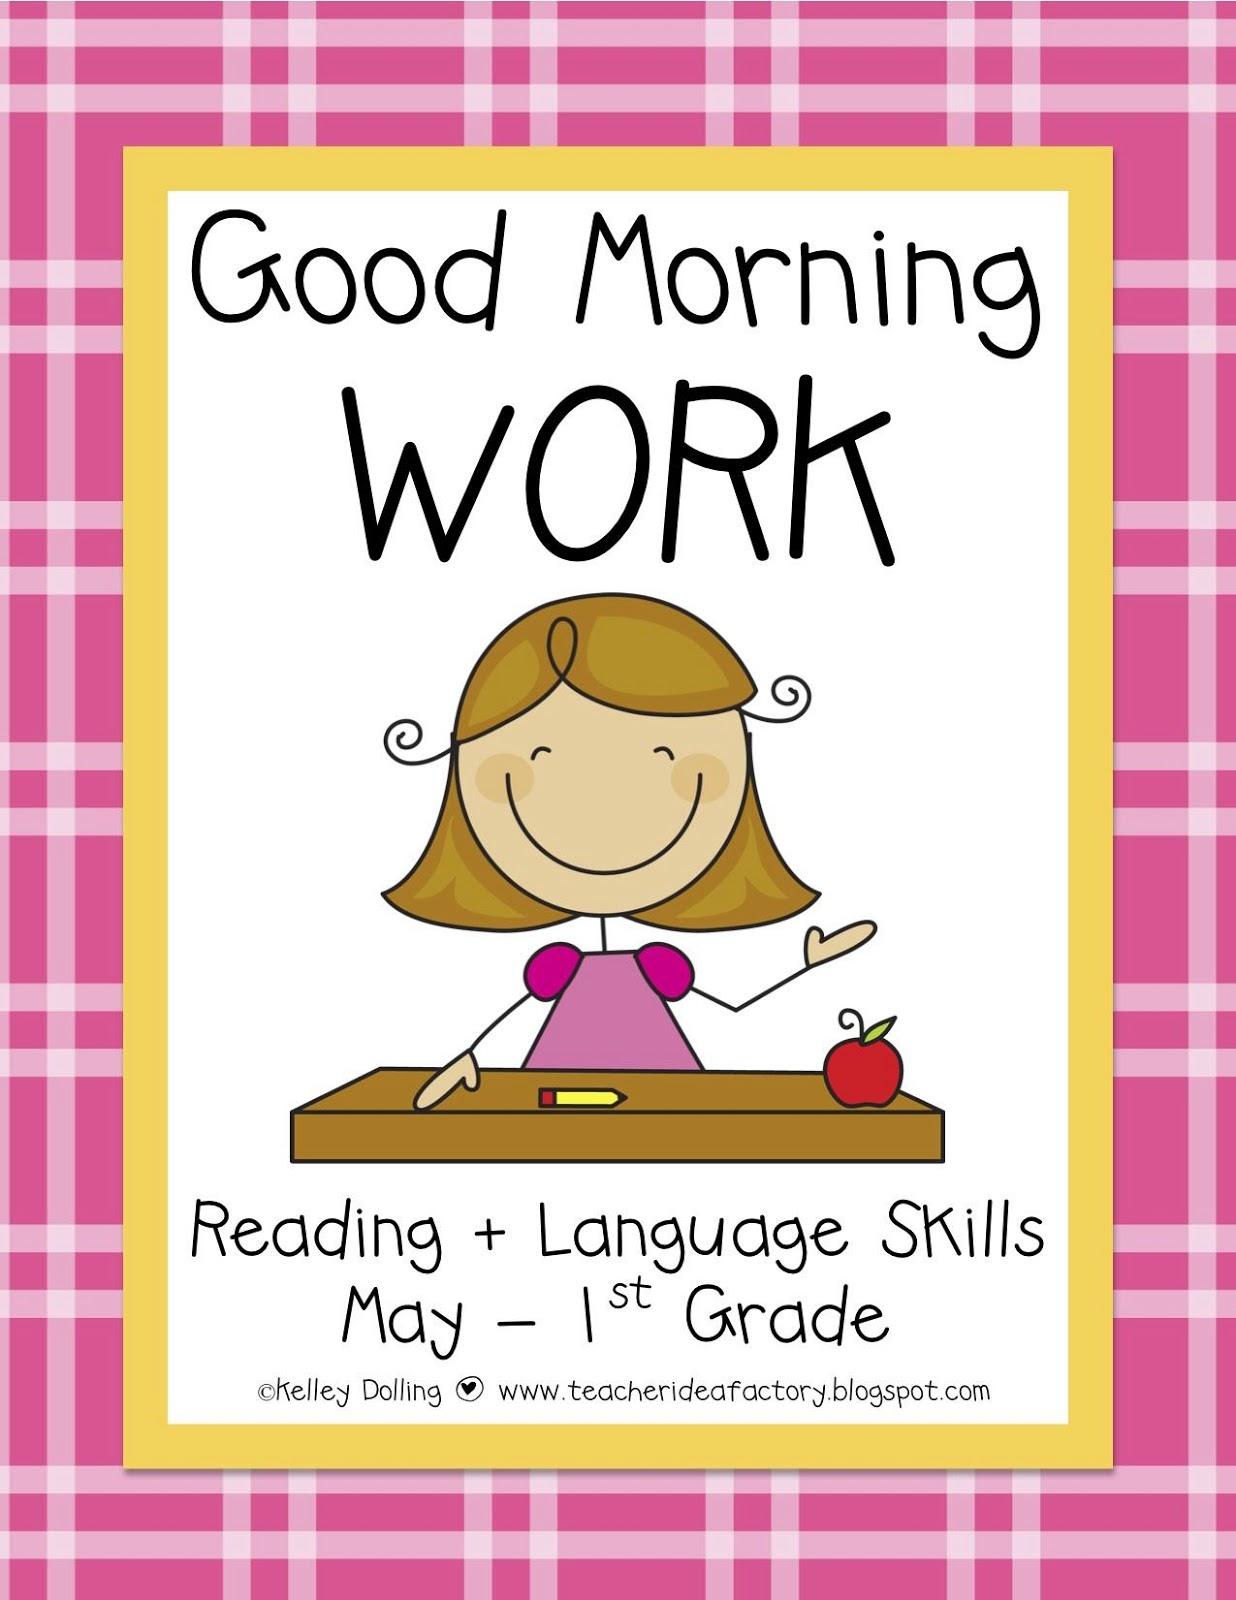 Good Morning Work Mommies Free Stuff Teacher Idea